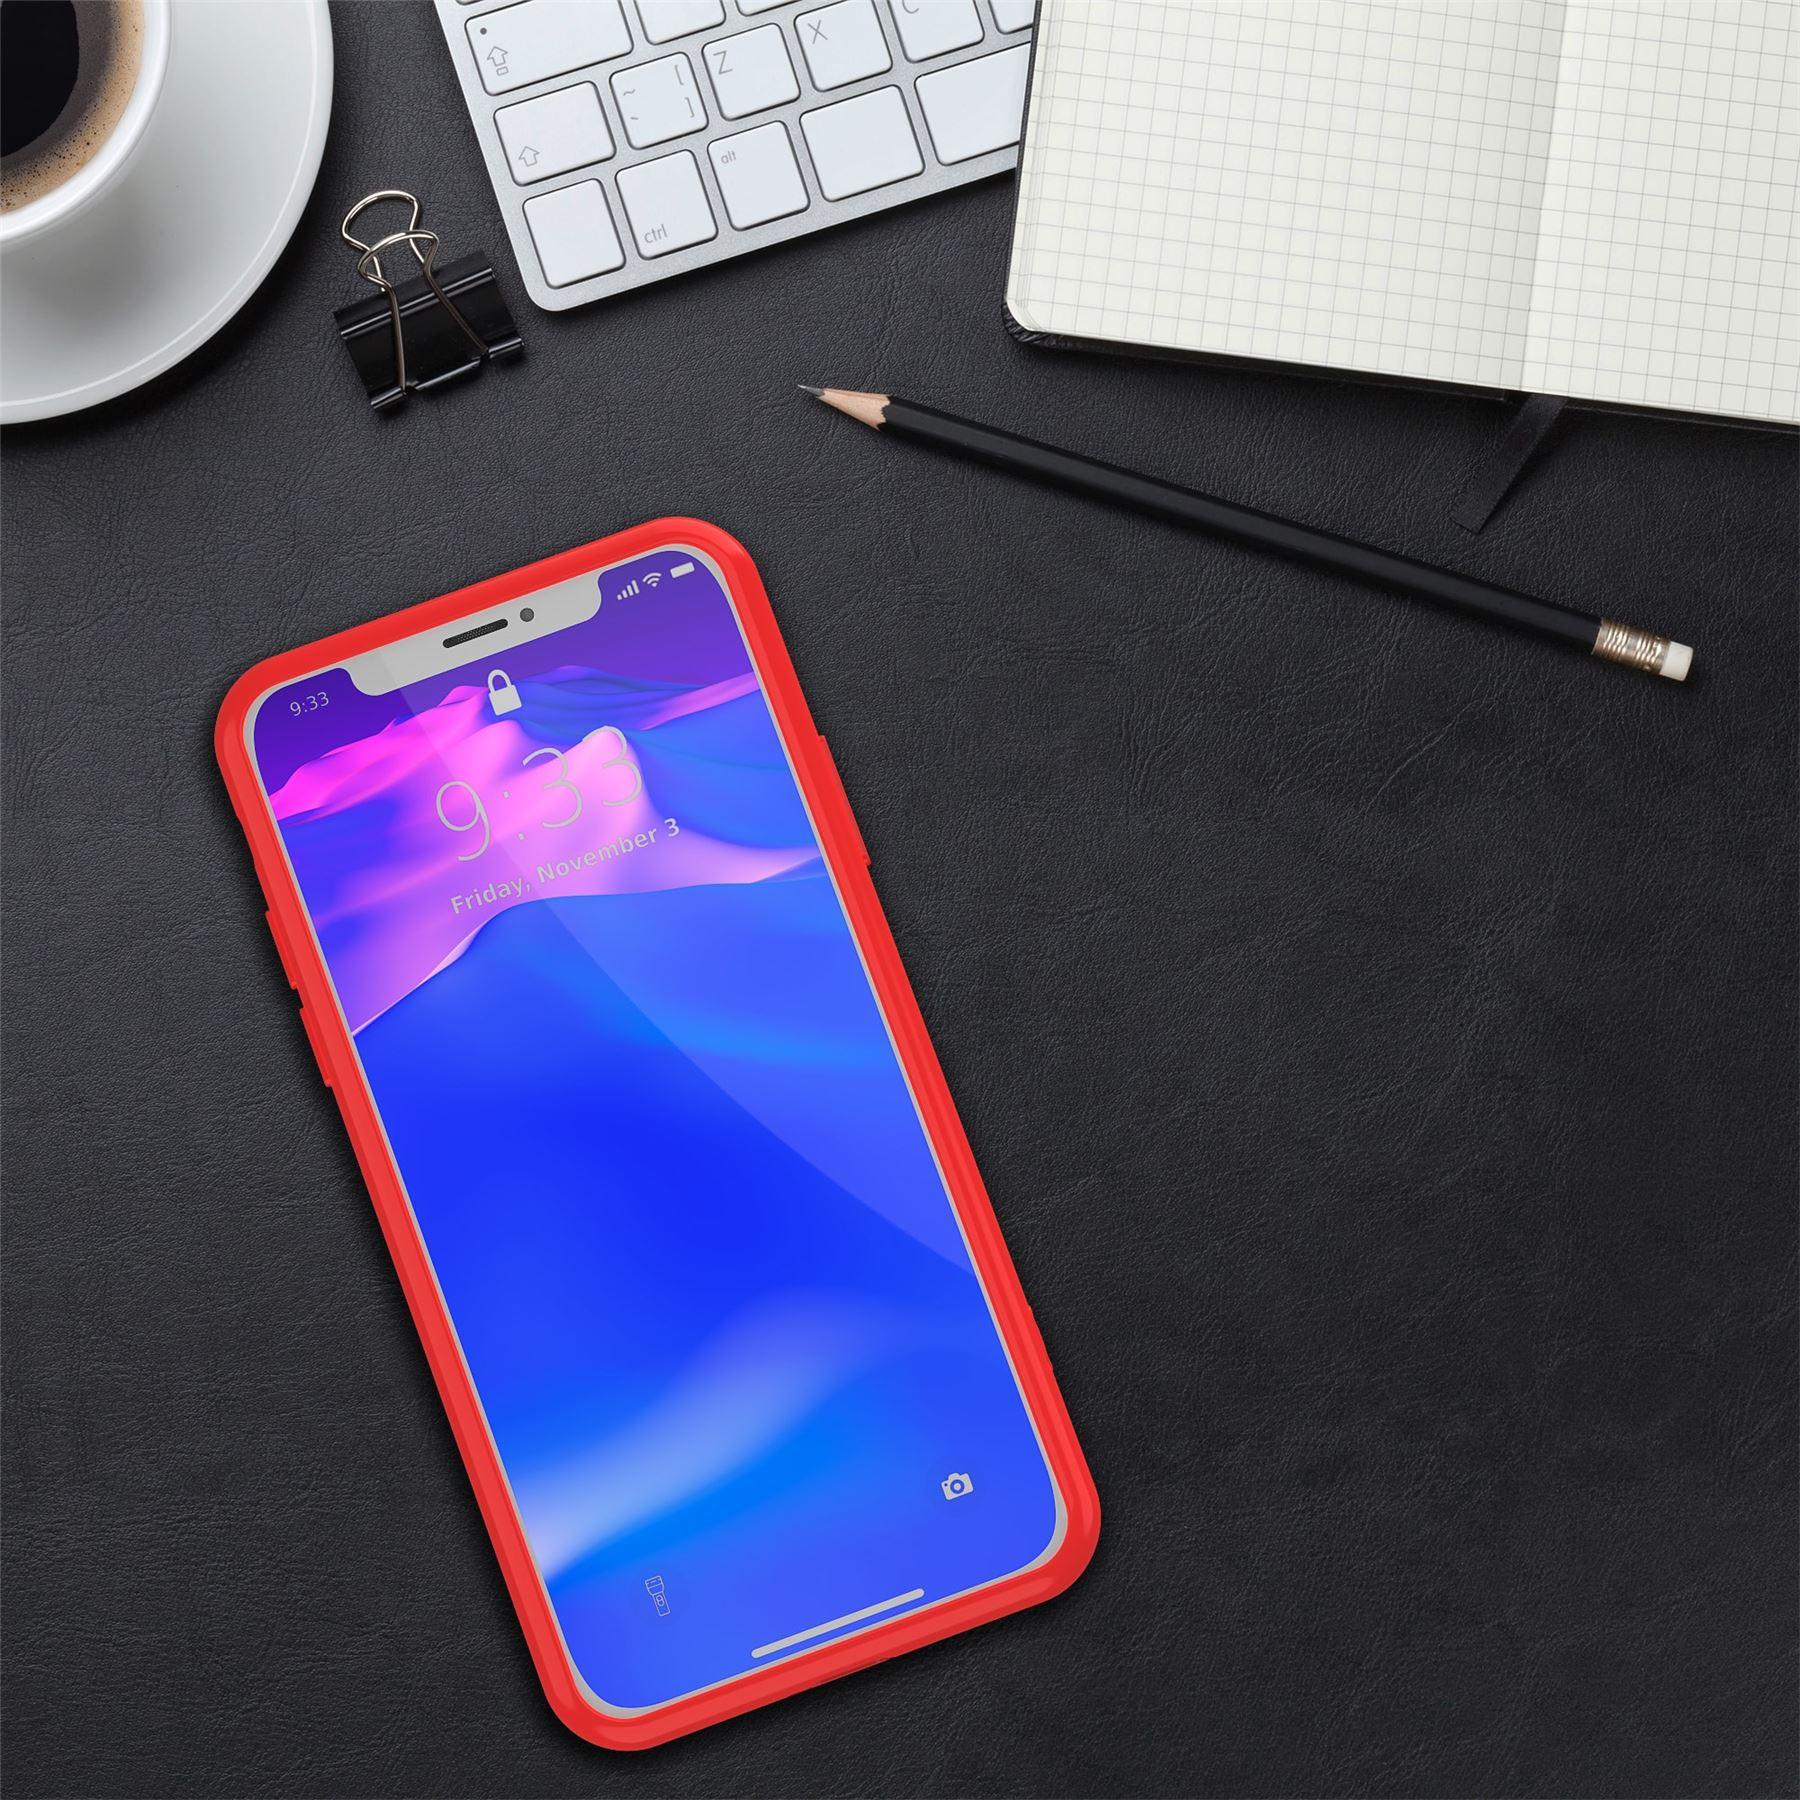 thumbnail 23 - For Apple iPhone XR Xs Max X 8 7 Plus 6 5 Se Case Cover Clear Transparent CS283